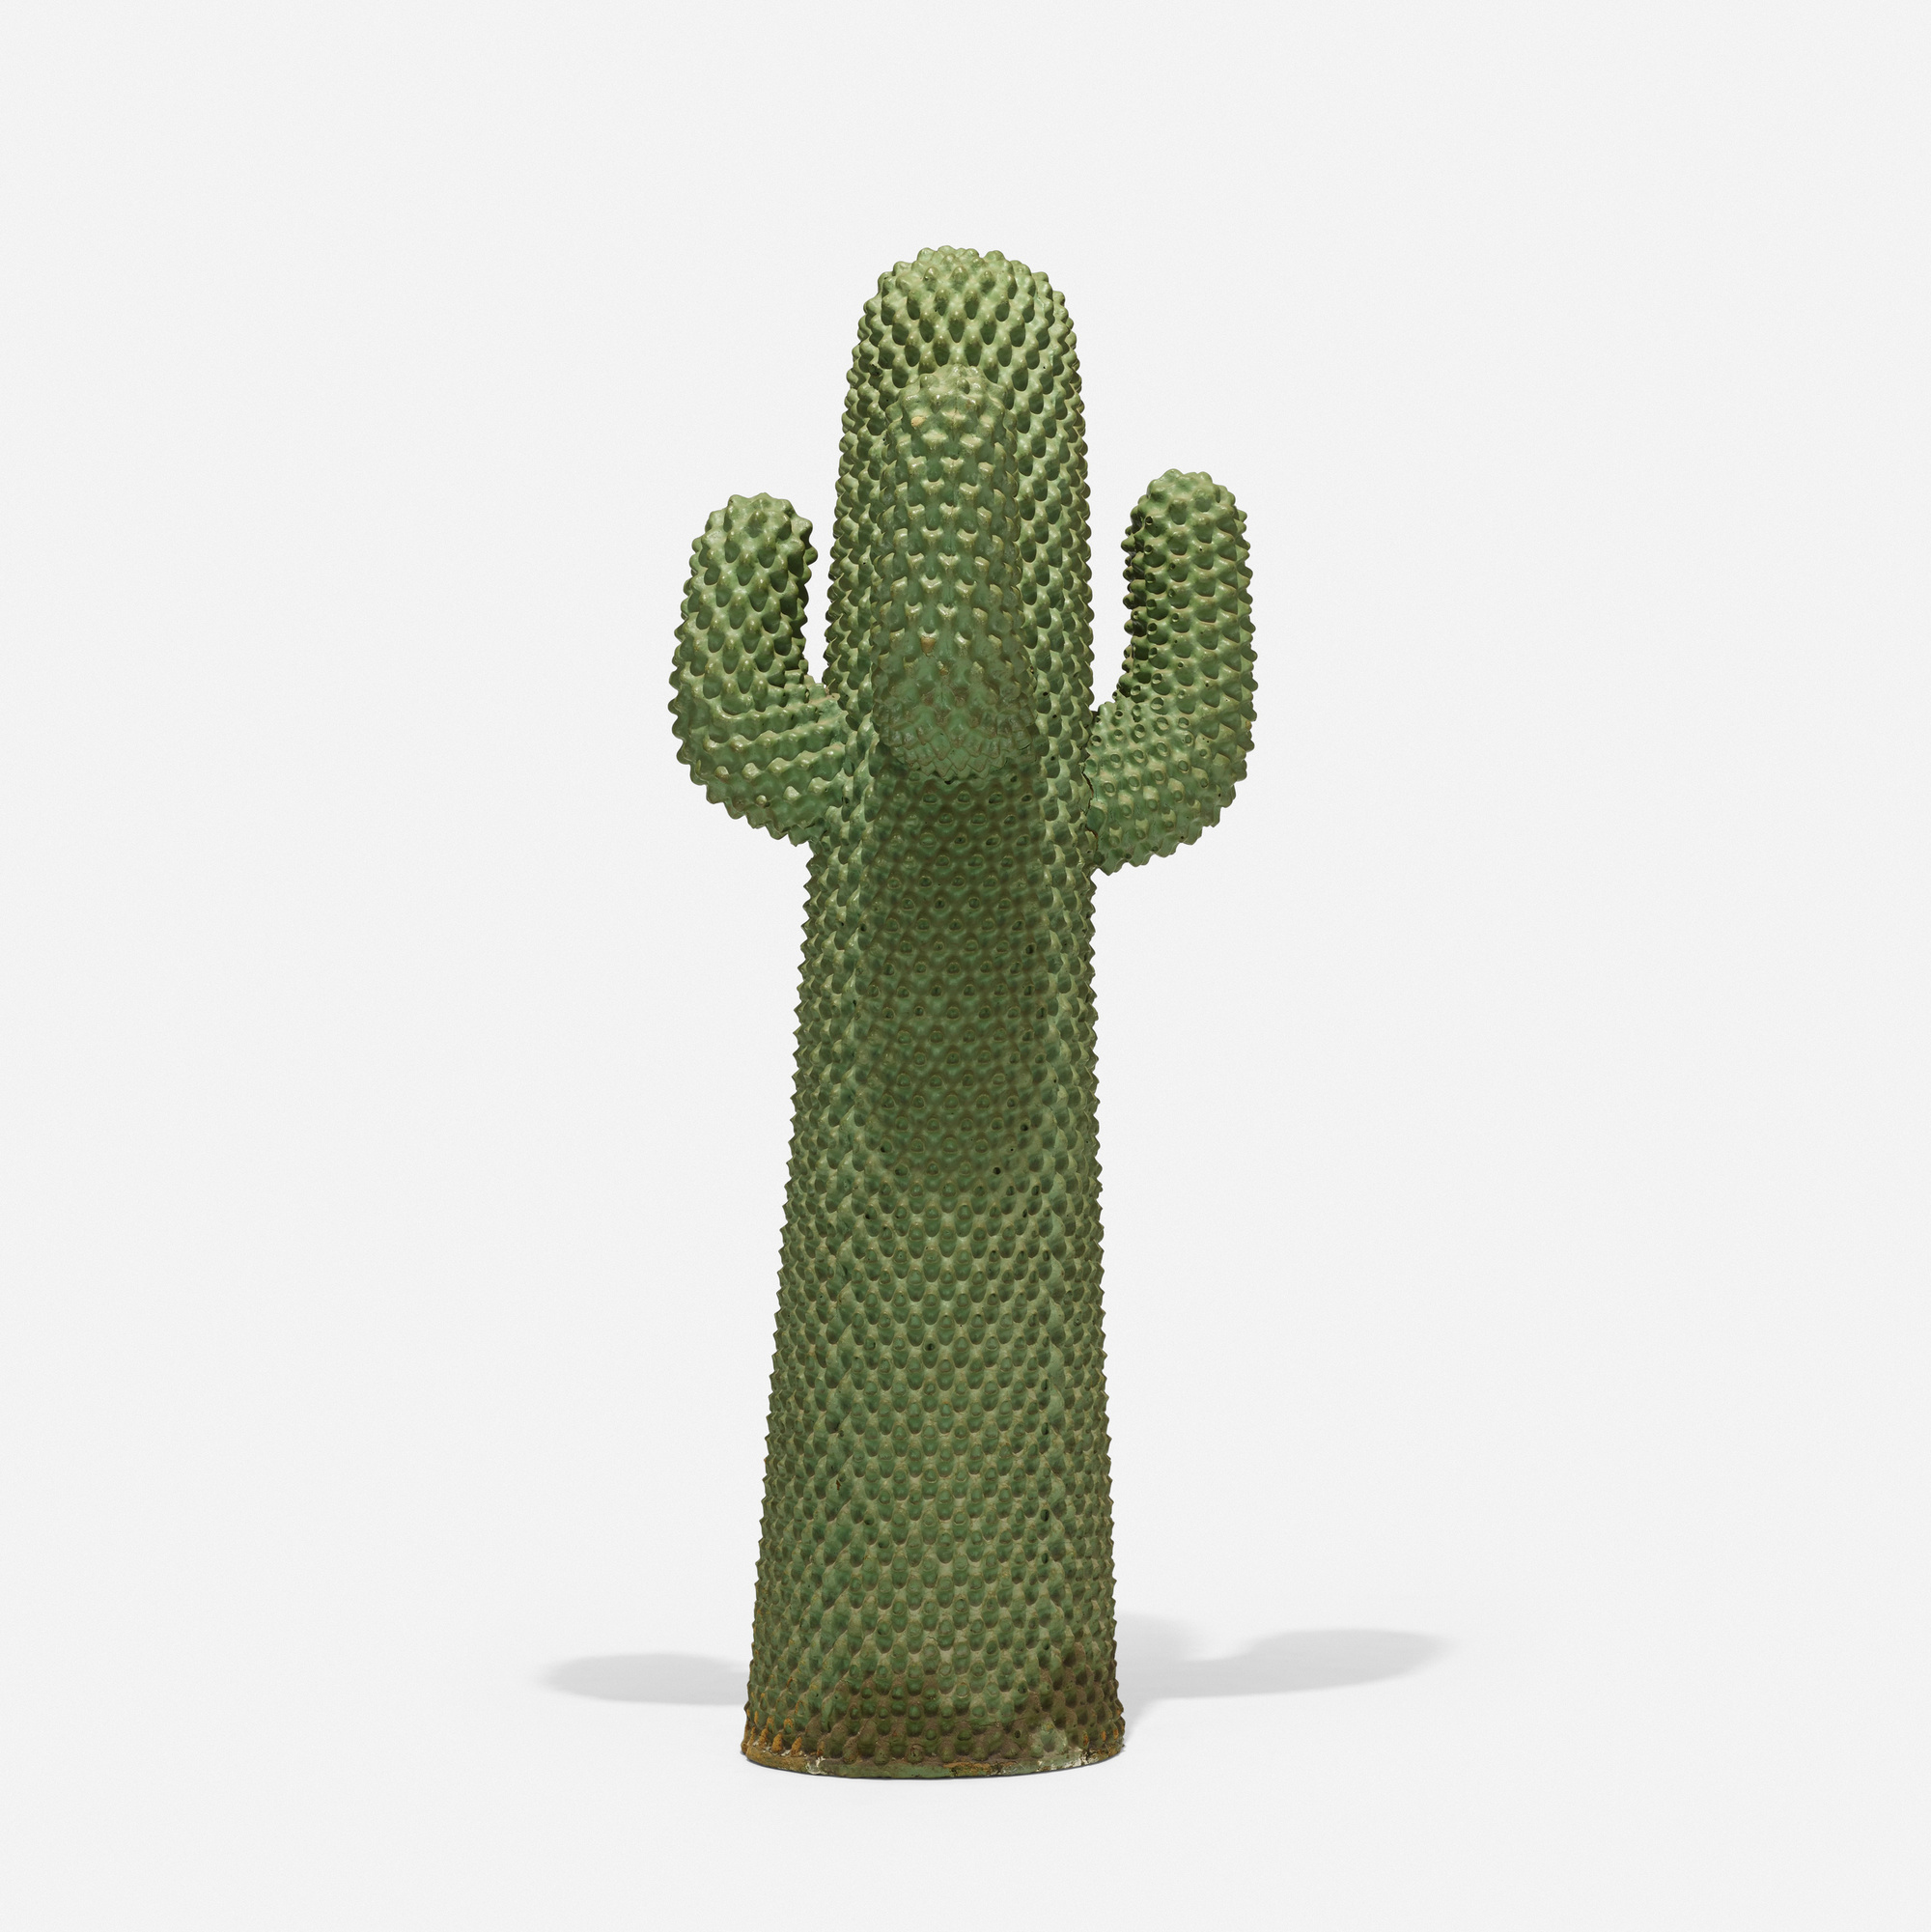 104: Guido Drocco and Franco Mello / Cactus coatrack (2 of 2)